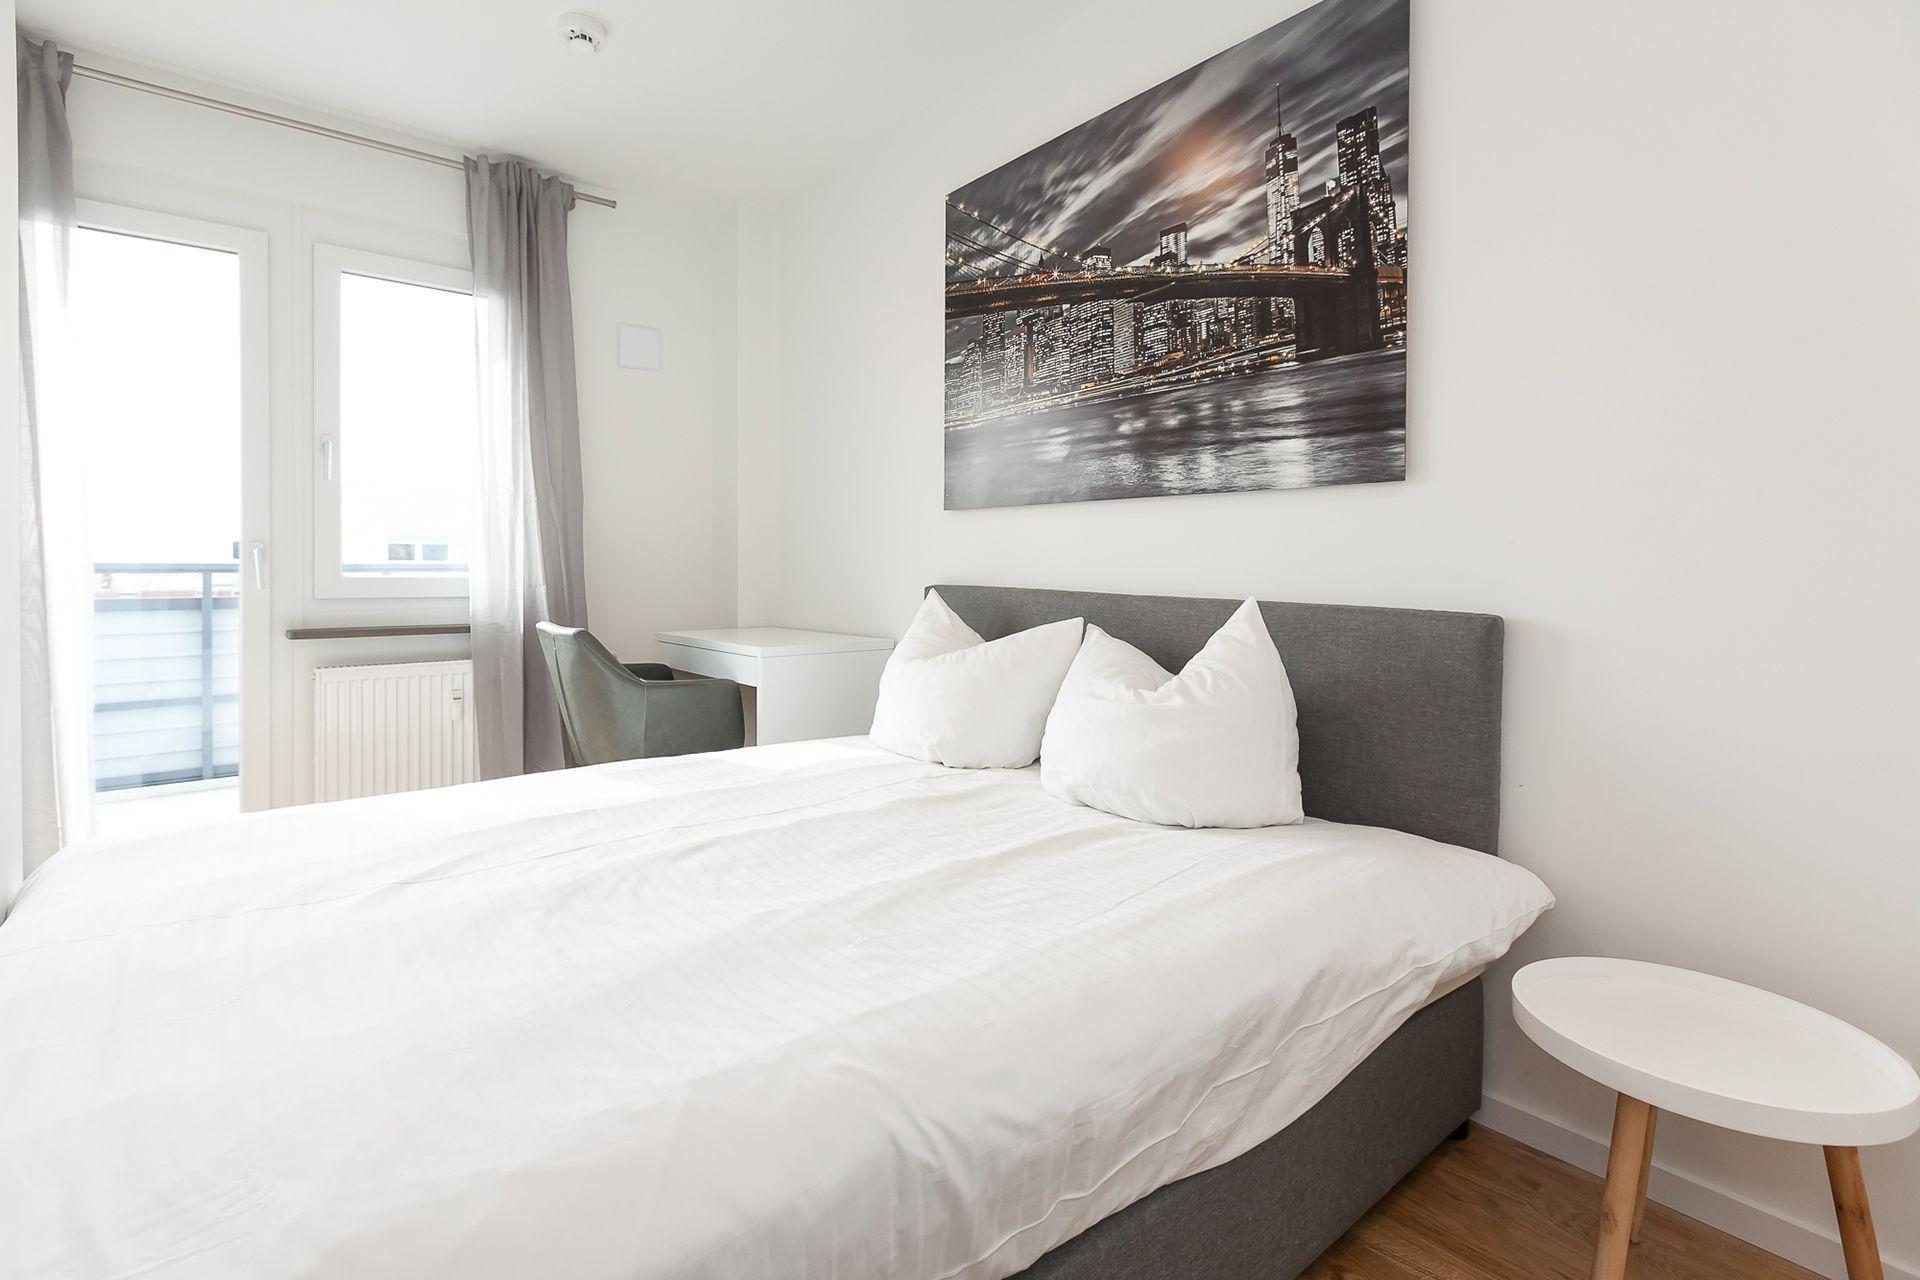 1 Bedroom - Small